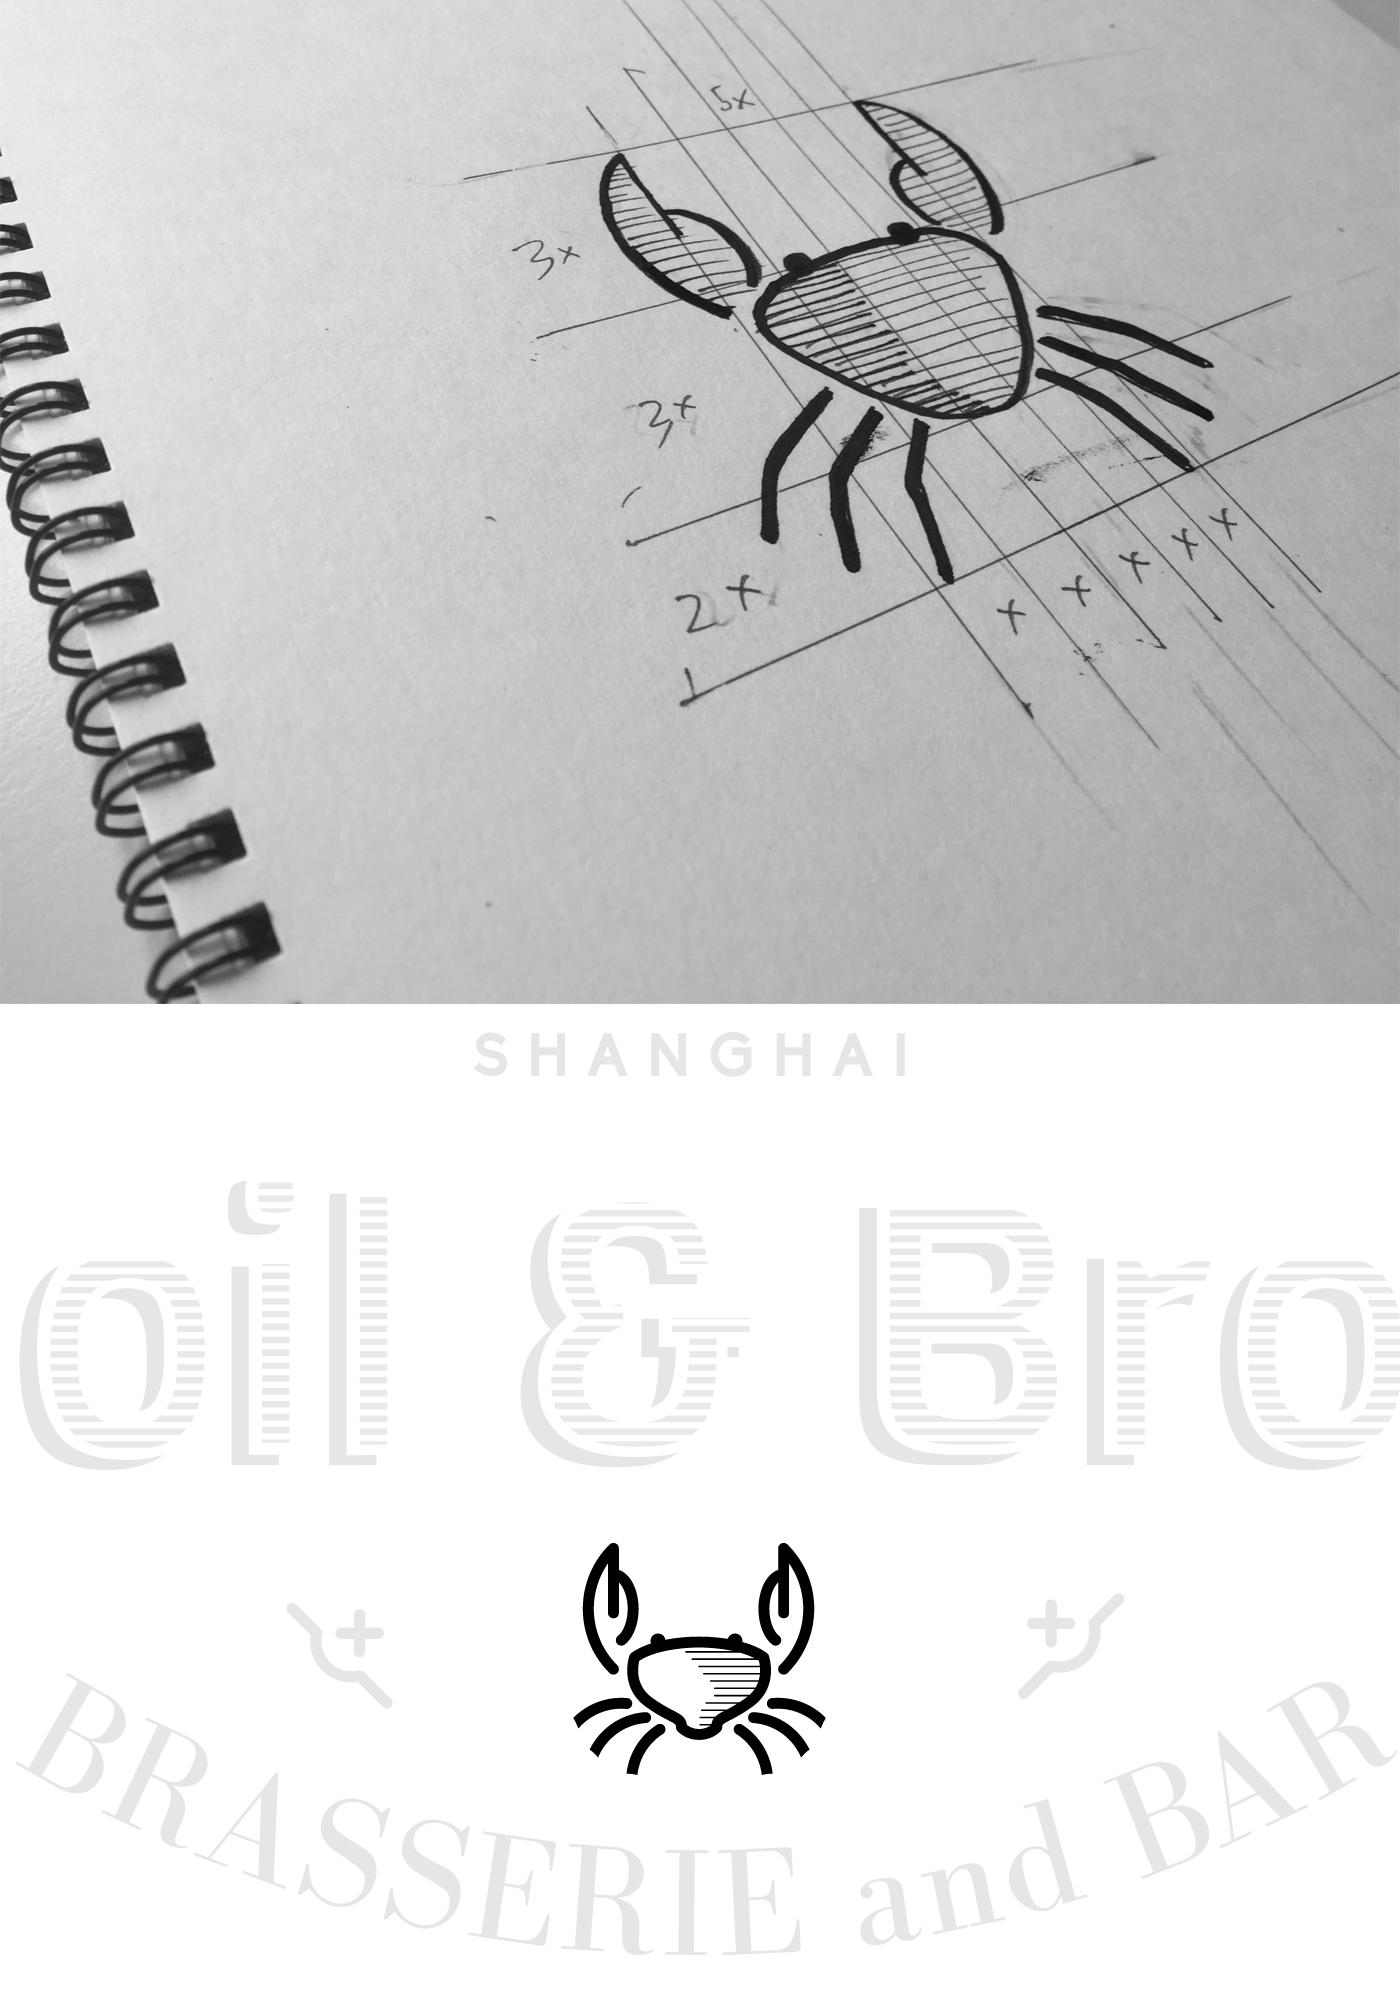 branding logo boil broil crab icon drawing chaubet